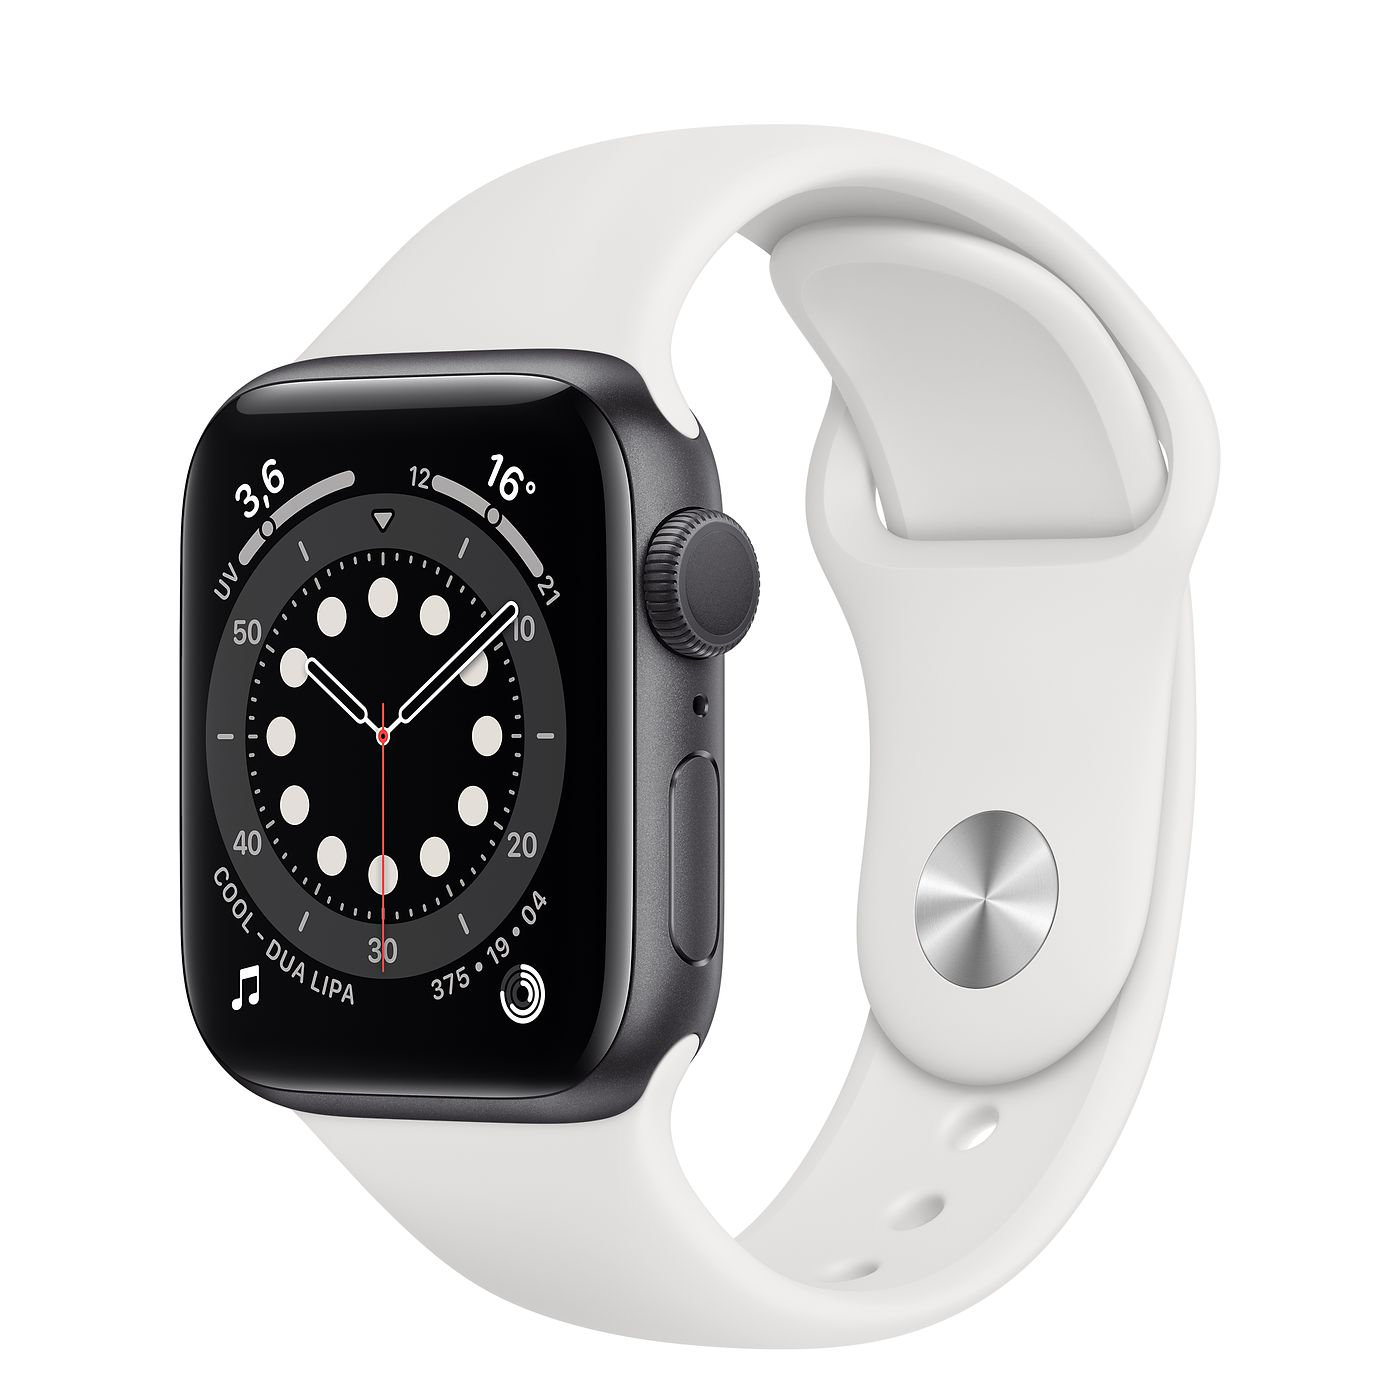 MTP52_VW_34FR+watch-40-alum-spacegray-nc-6s_VW_34FR_WF_CO_GEO_FR